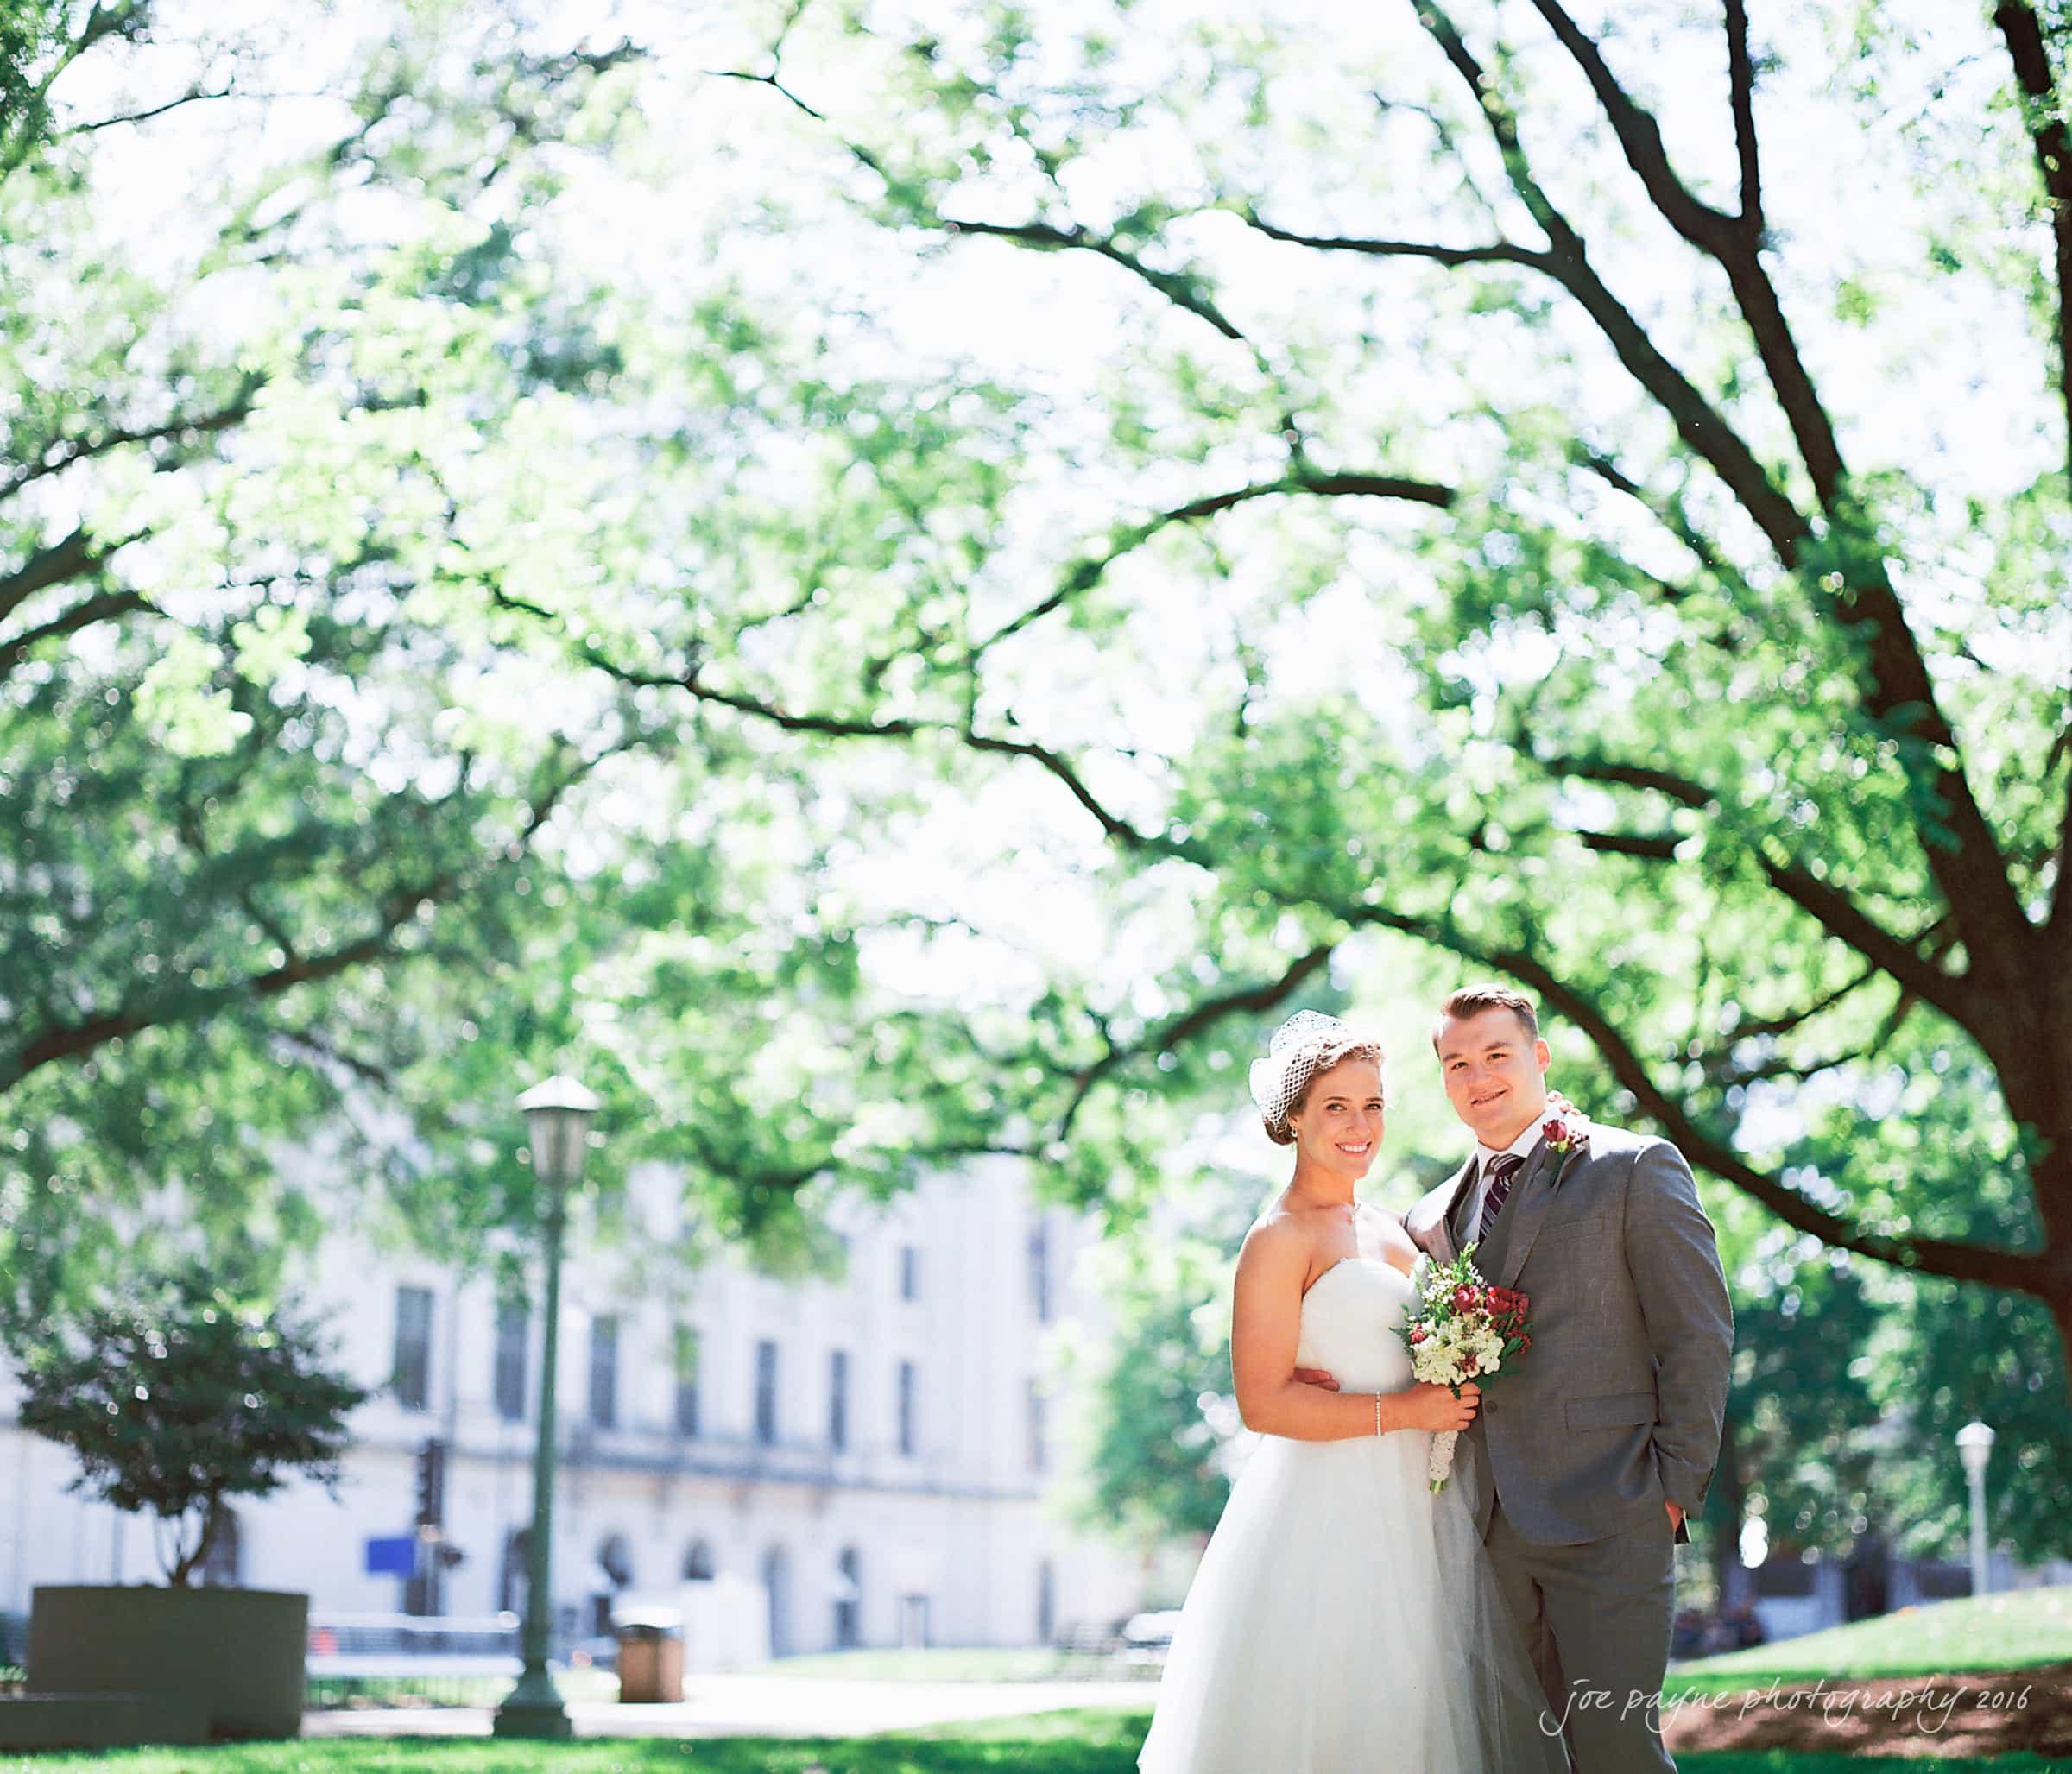 Downtown Raleigh Wedding Photographer - Alexandra & Trent -21